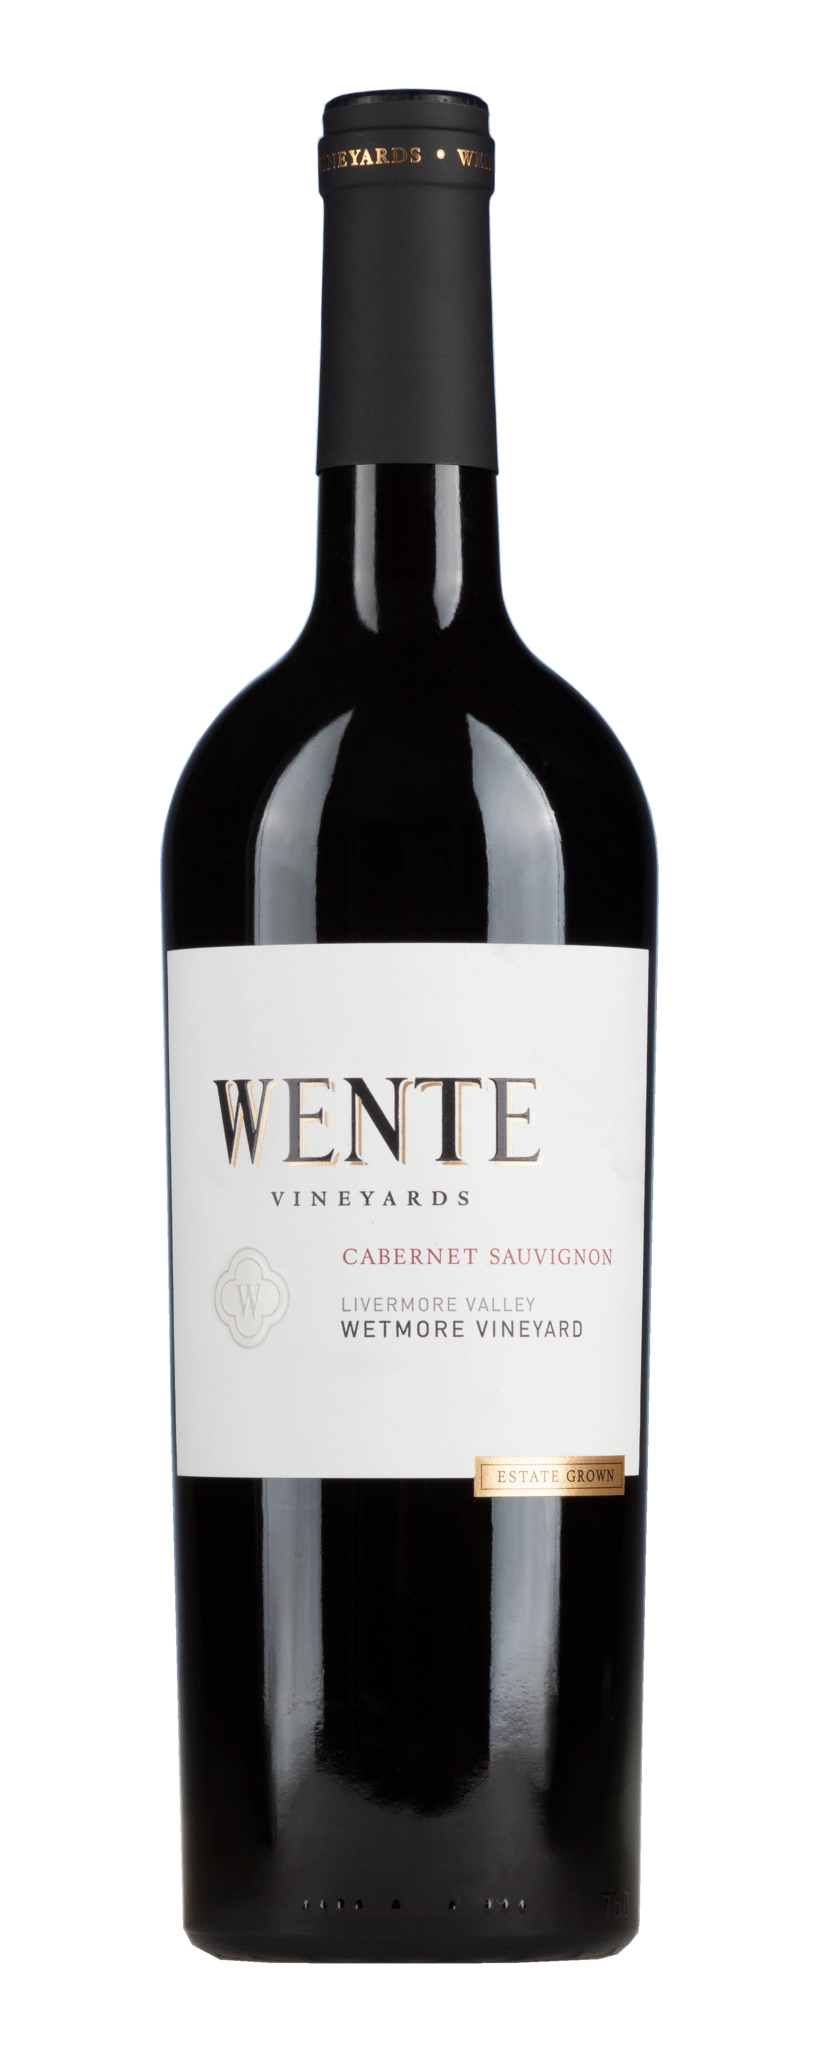 Wente Vineyards, Kalifornien 2017 Cabernet Sauvignon Wetmore Vineyard, Wente, California